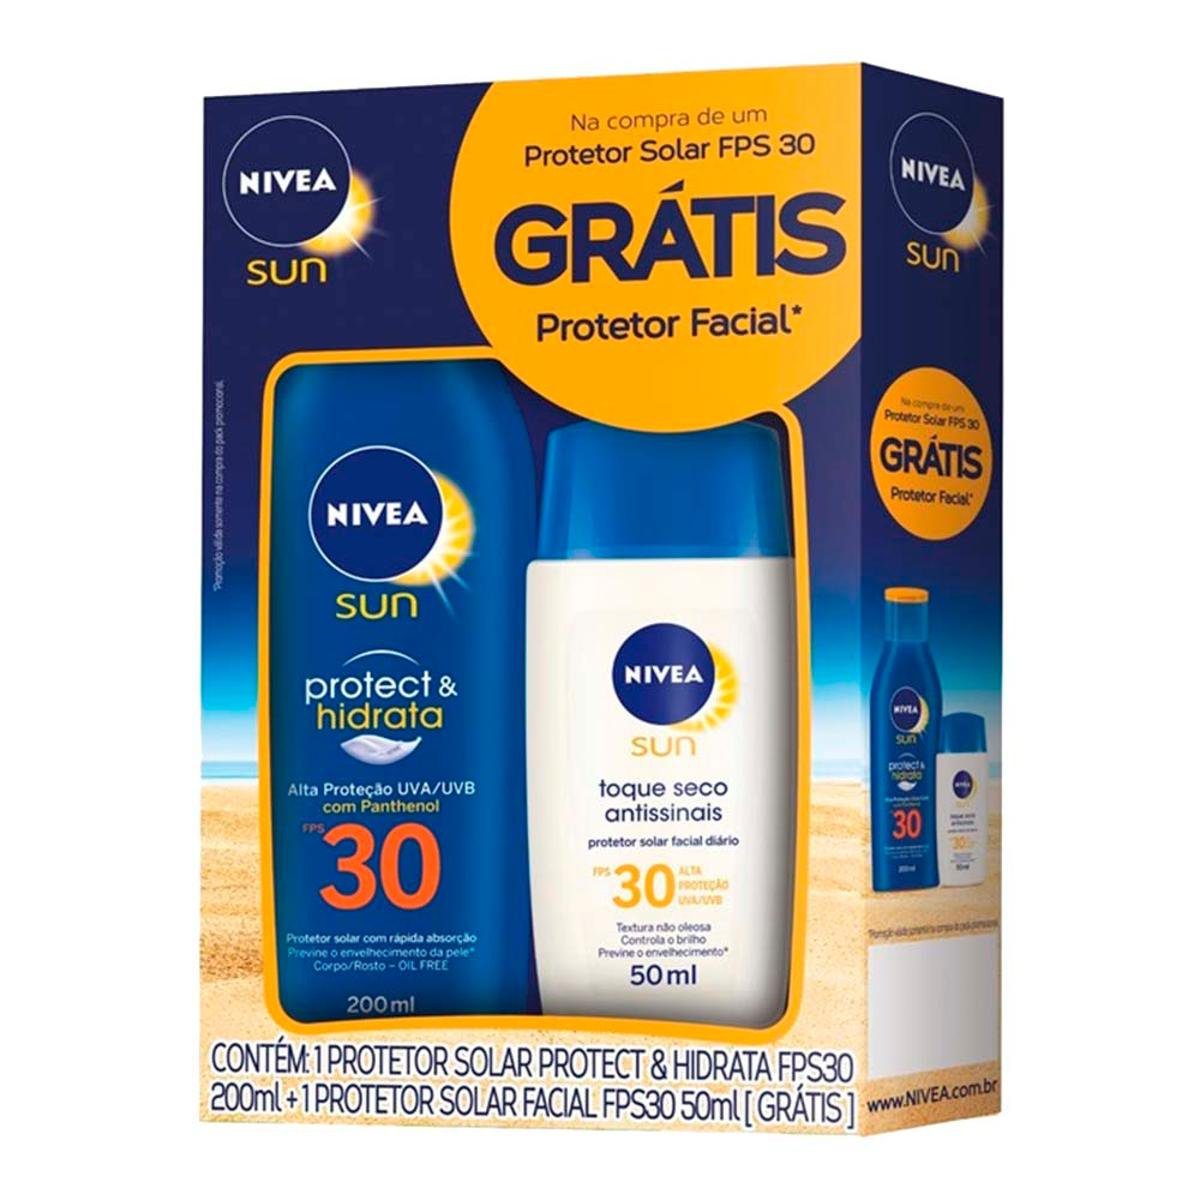 Kit Nivea Sun Protetor Solar Hidratante FPS 30 200ml + Facial FPS 30 50g - Compre  Agora  7a2bfe3870d1c